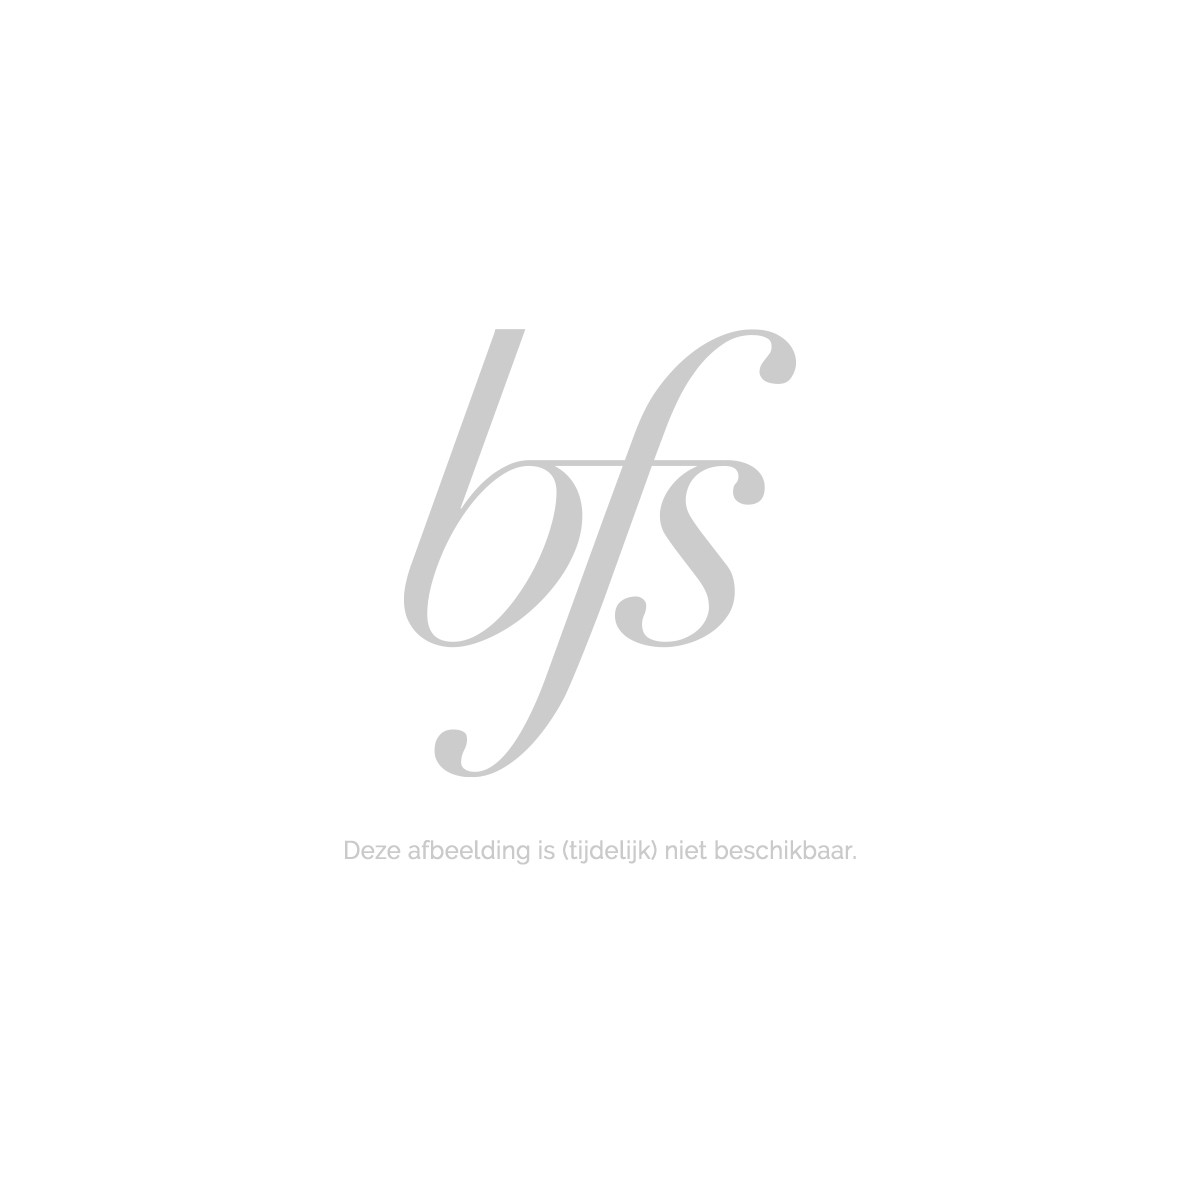 Deborah Milano 5-In-1 Extraordinary Mascara Black + Eyeliner Eyepencil Black + Schwarzes Etui